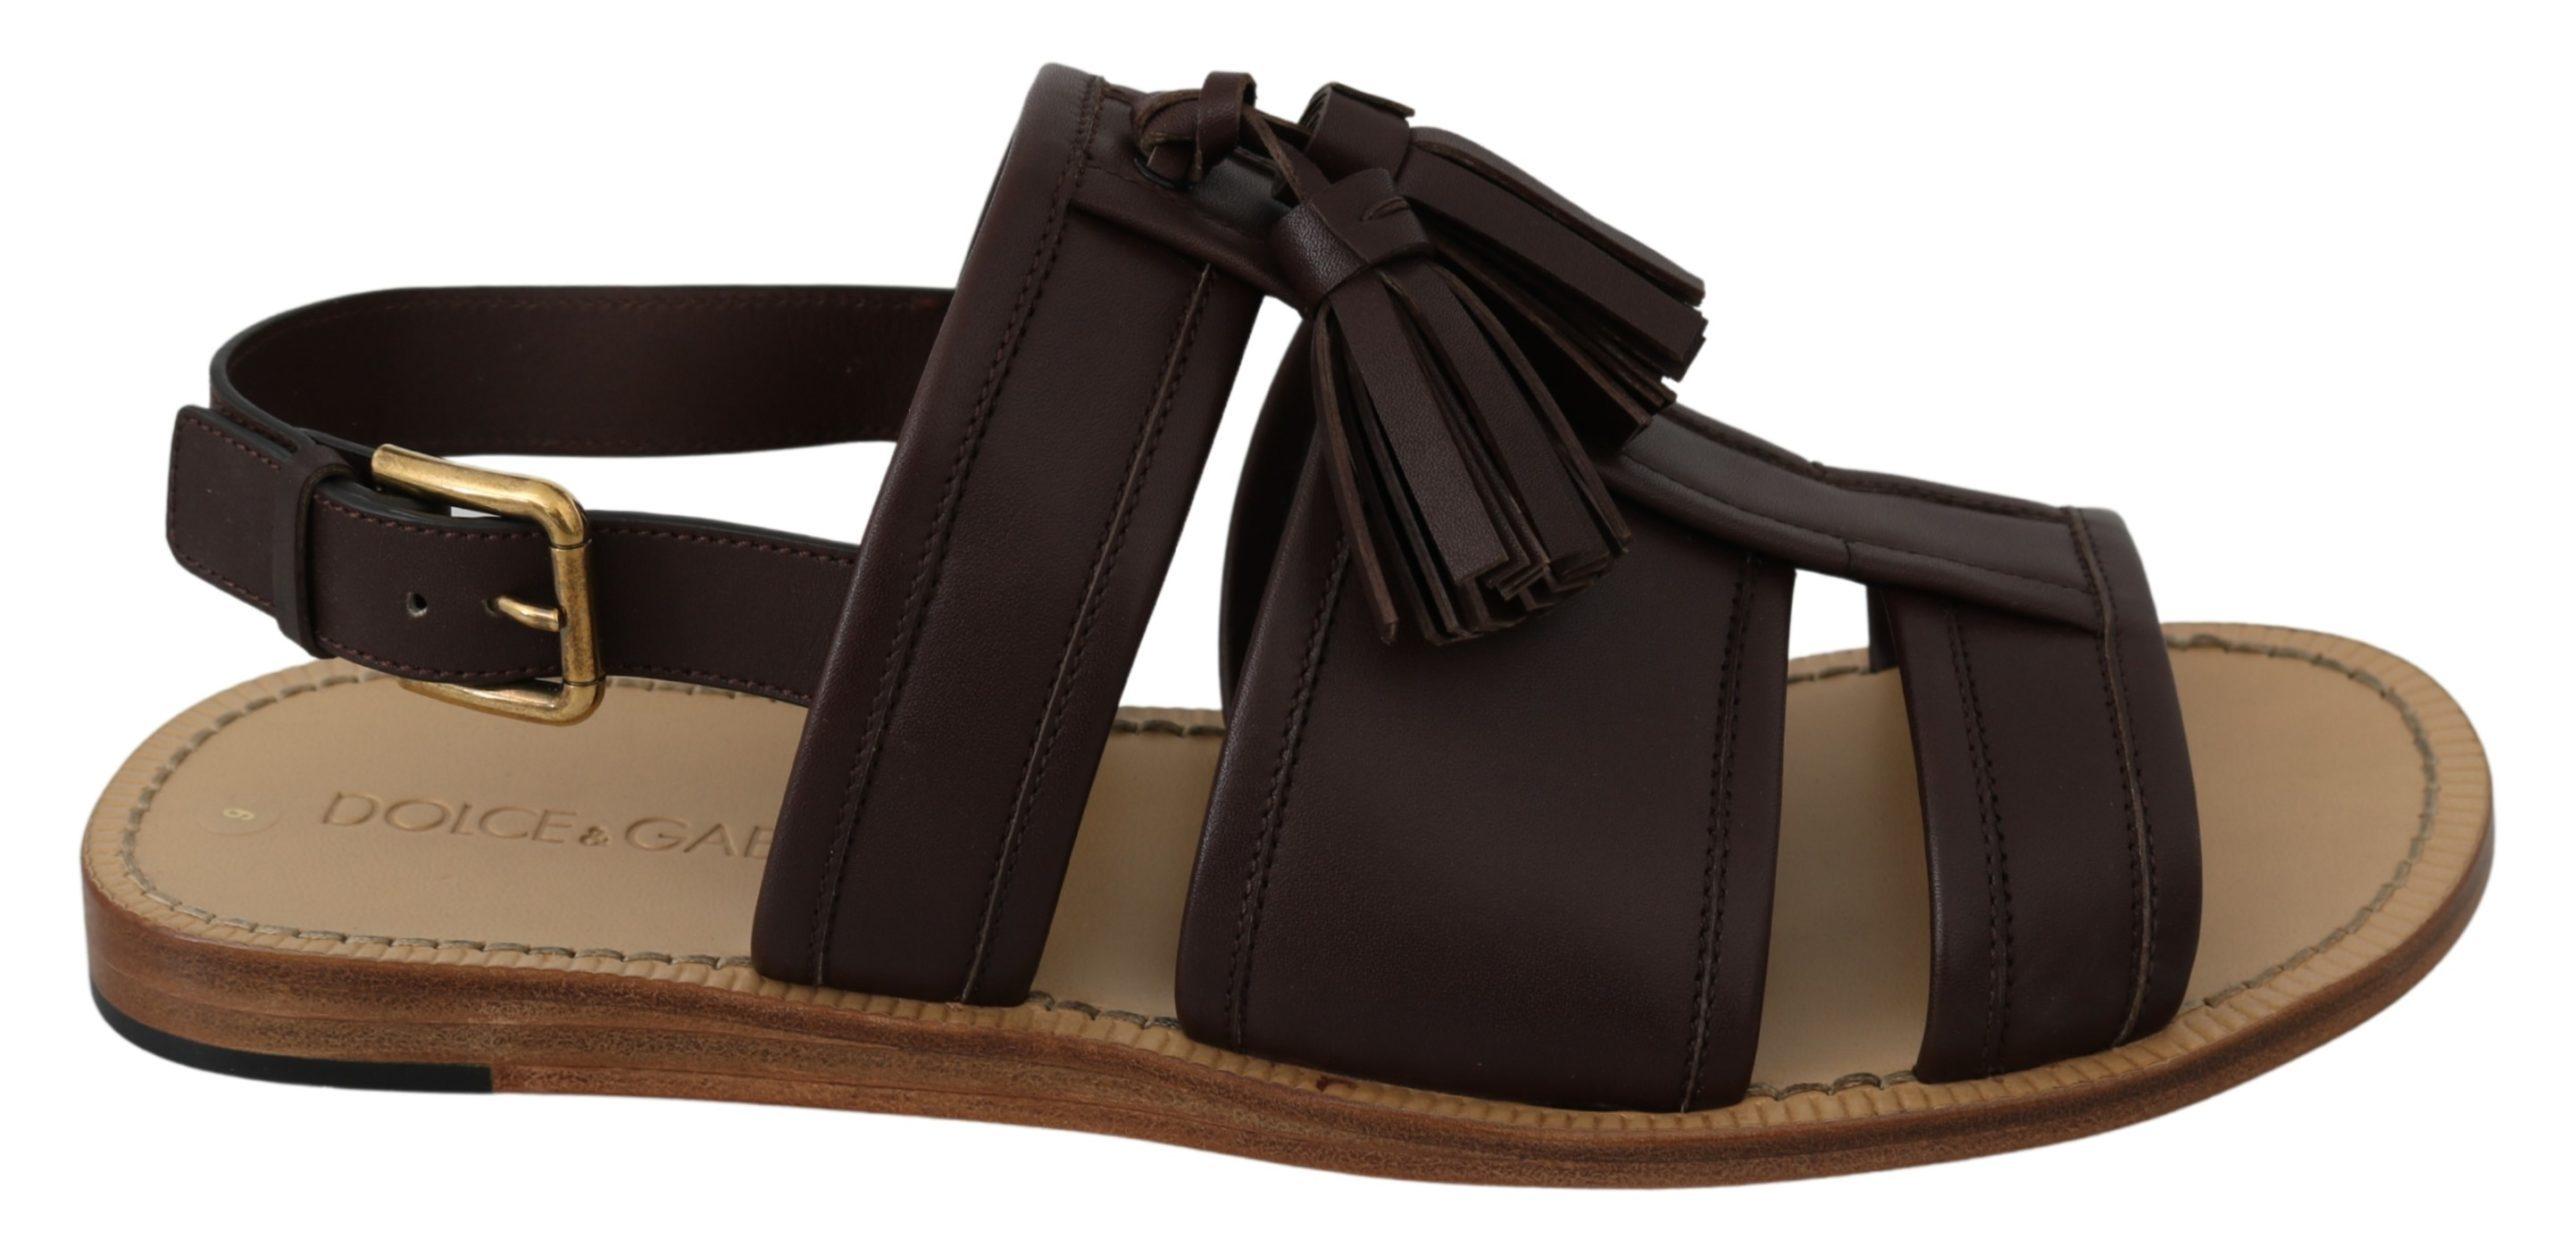 Dolce & Gabbana Men's Leather Buckle Sandal Brown MV3031 - EU43/US10